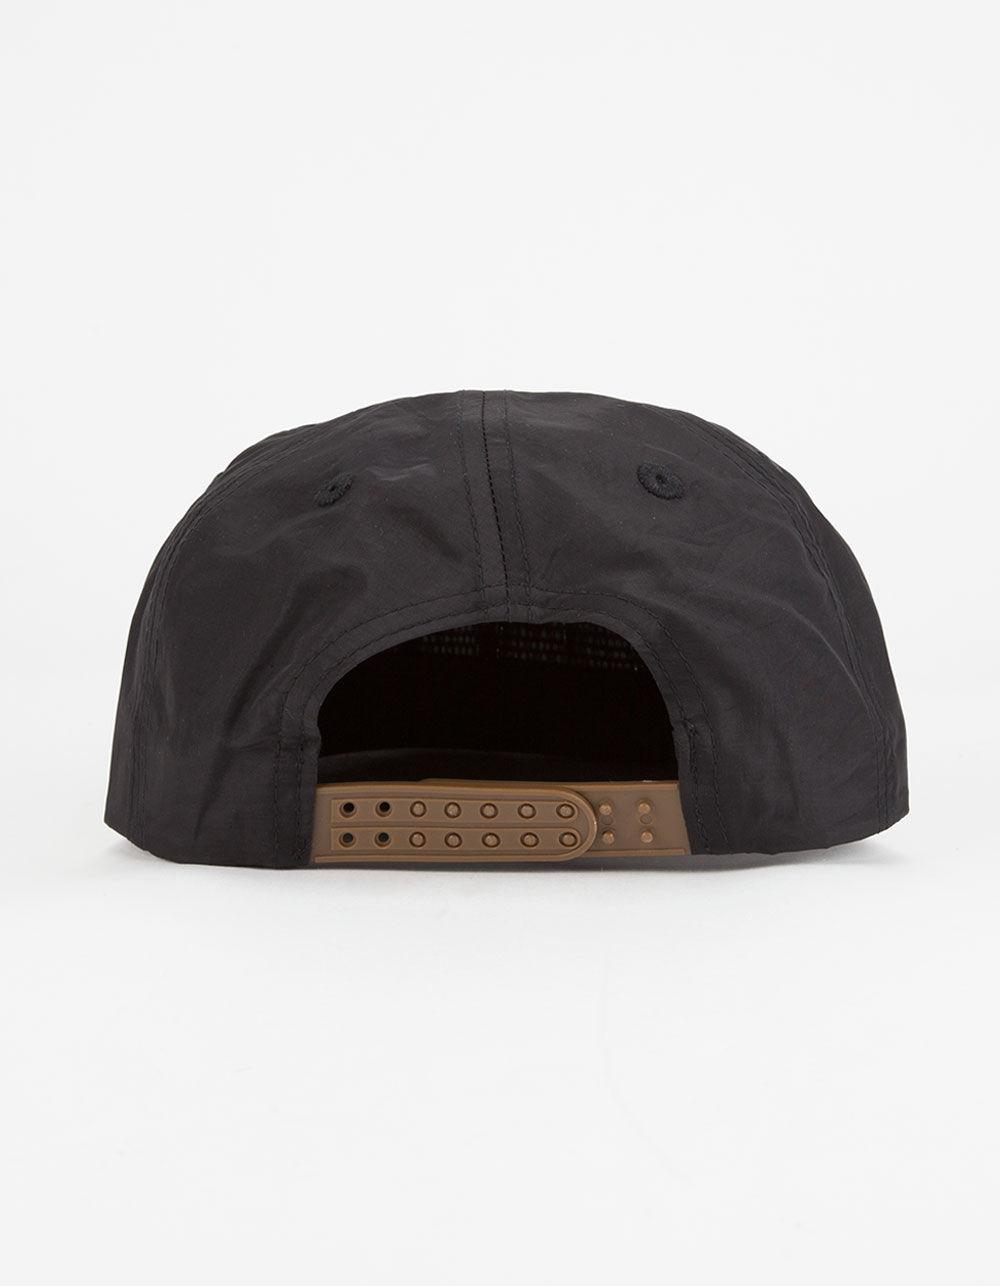 6f46a05a5 Lyst - Captain Fin Shark Fin Mens Snapback Hat in Black for Men